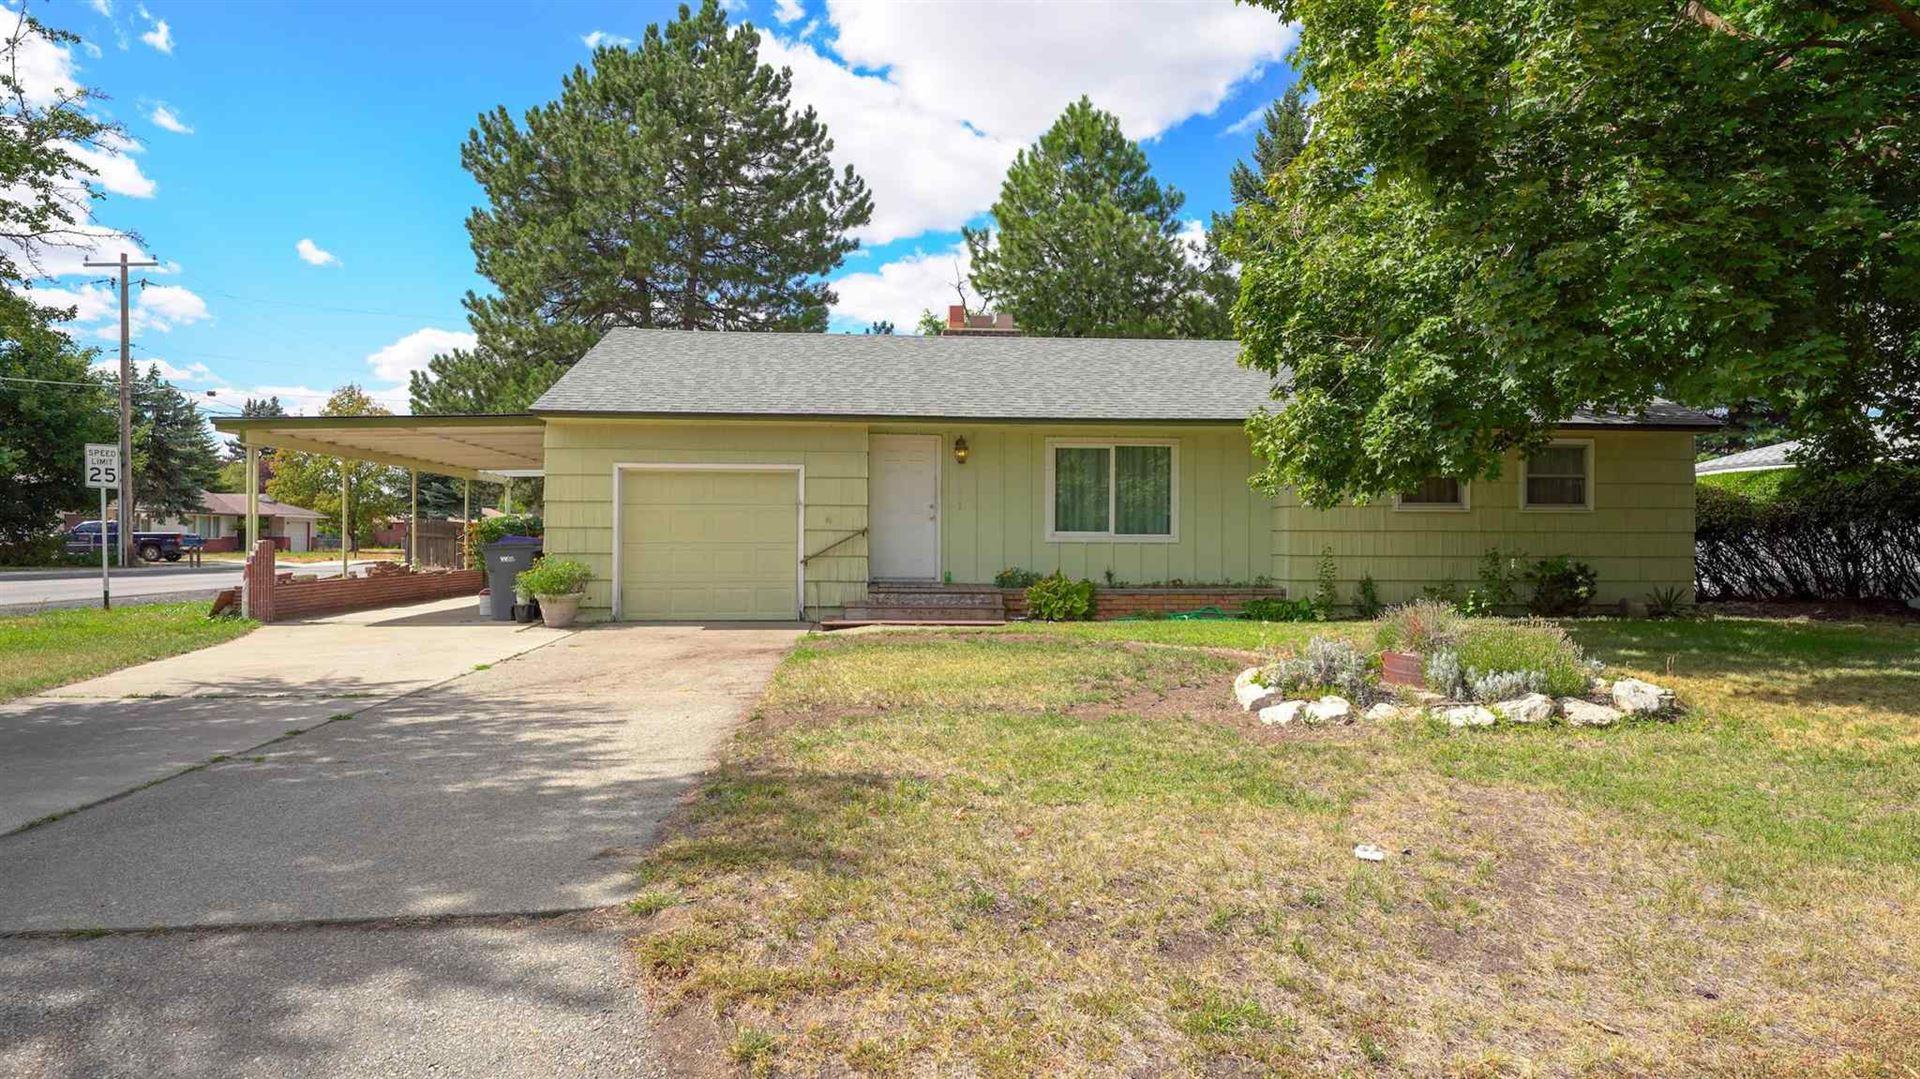 2205 N Hutchinson Rd, Spokane Valley, WA 99212 - #: 202121655